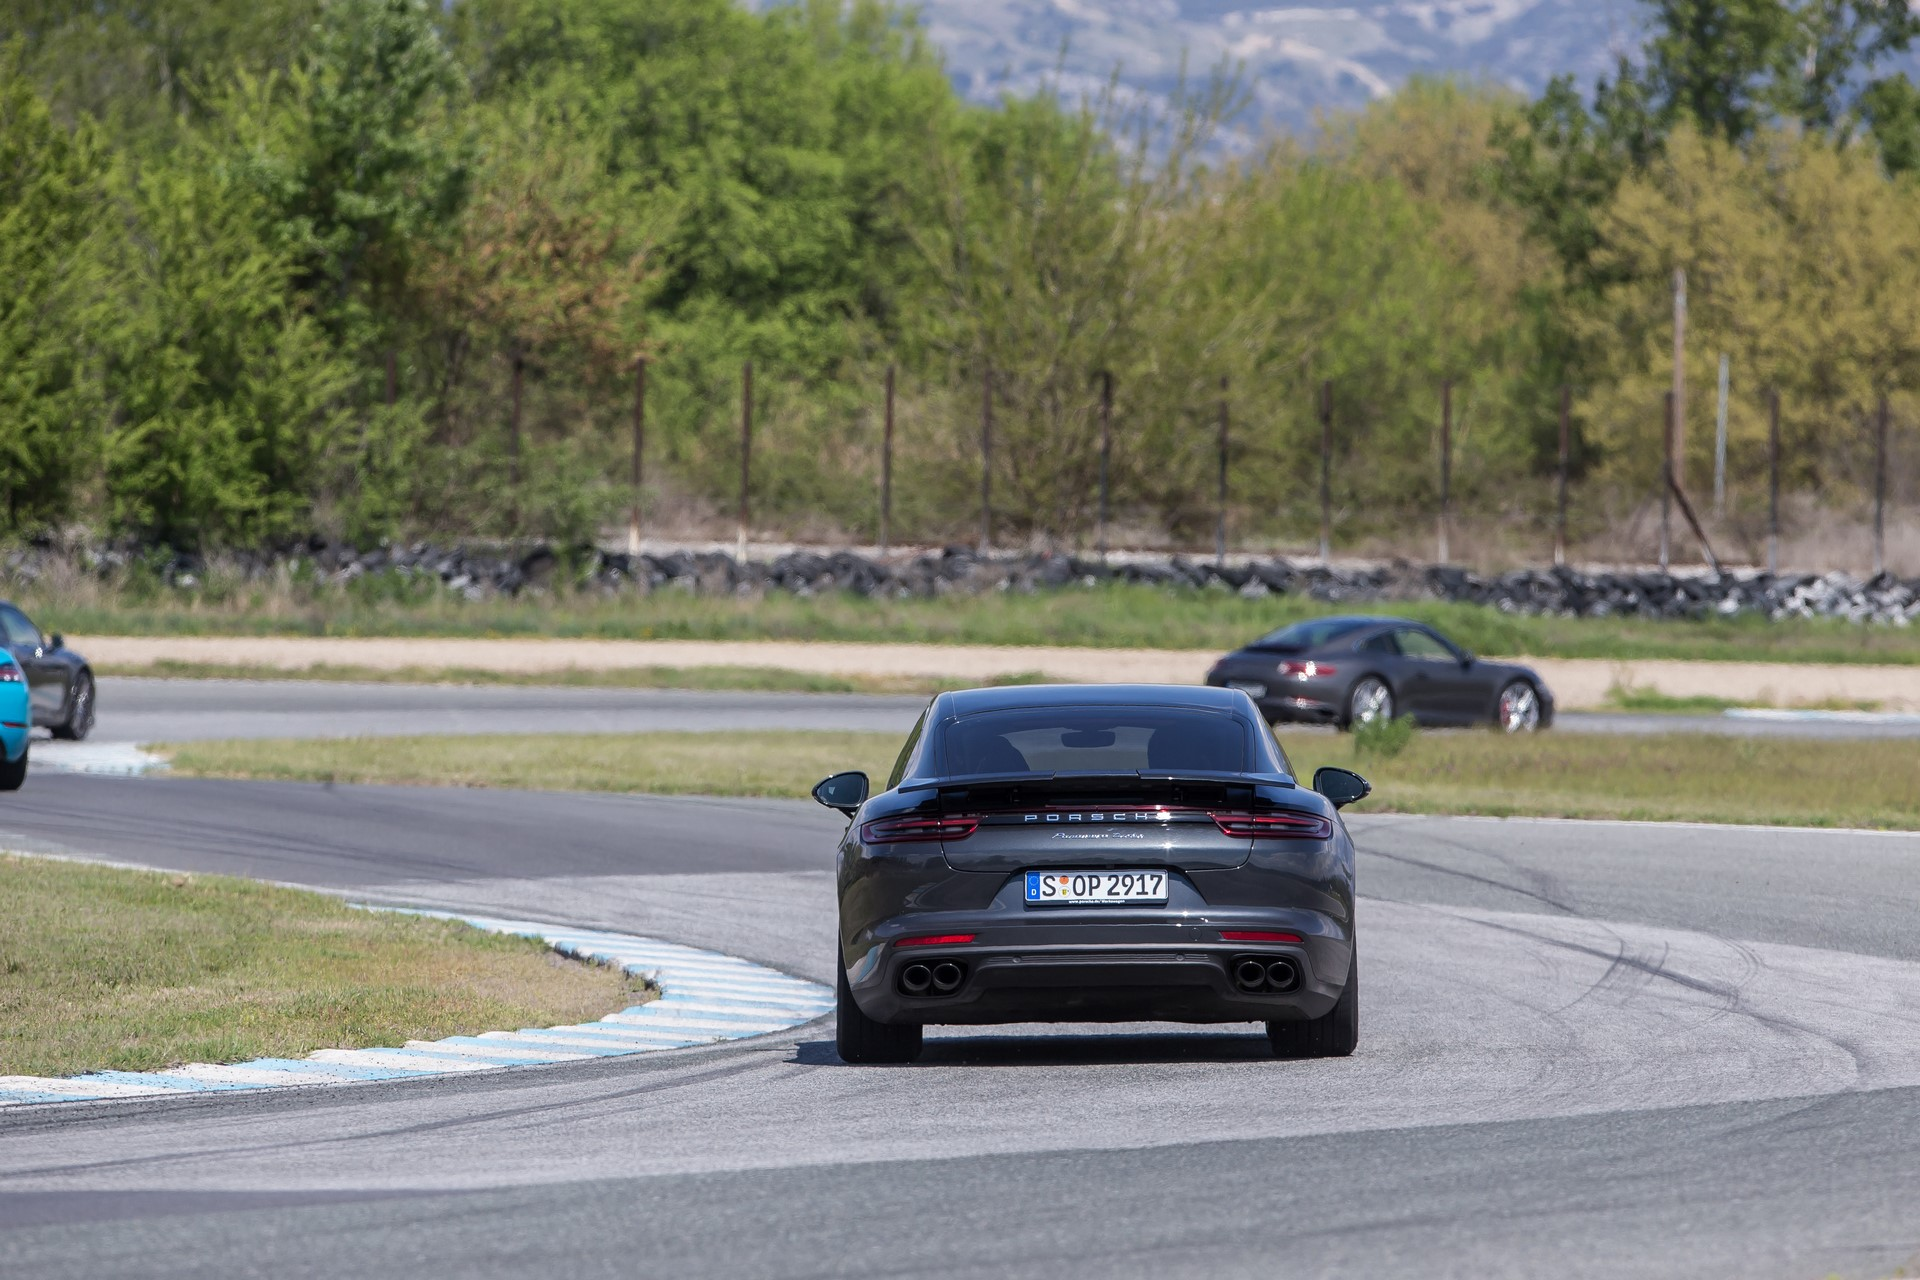 Porsche Driving Experience 2017 Serres (91)